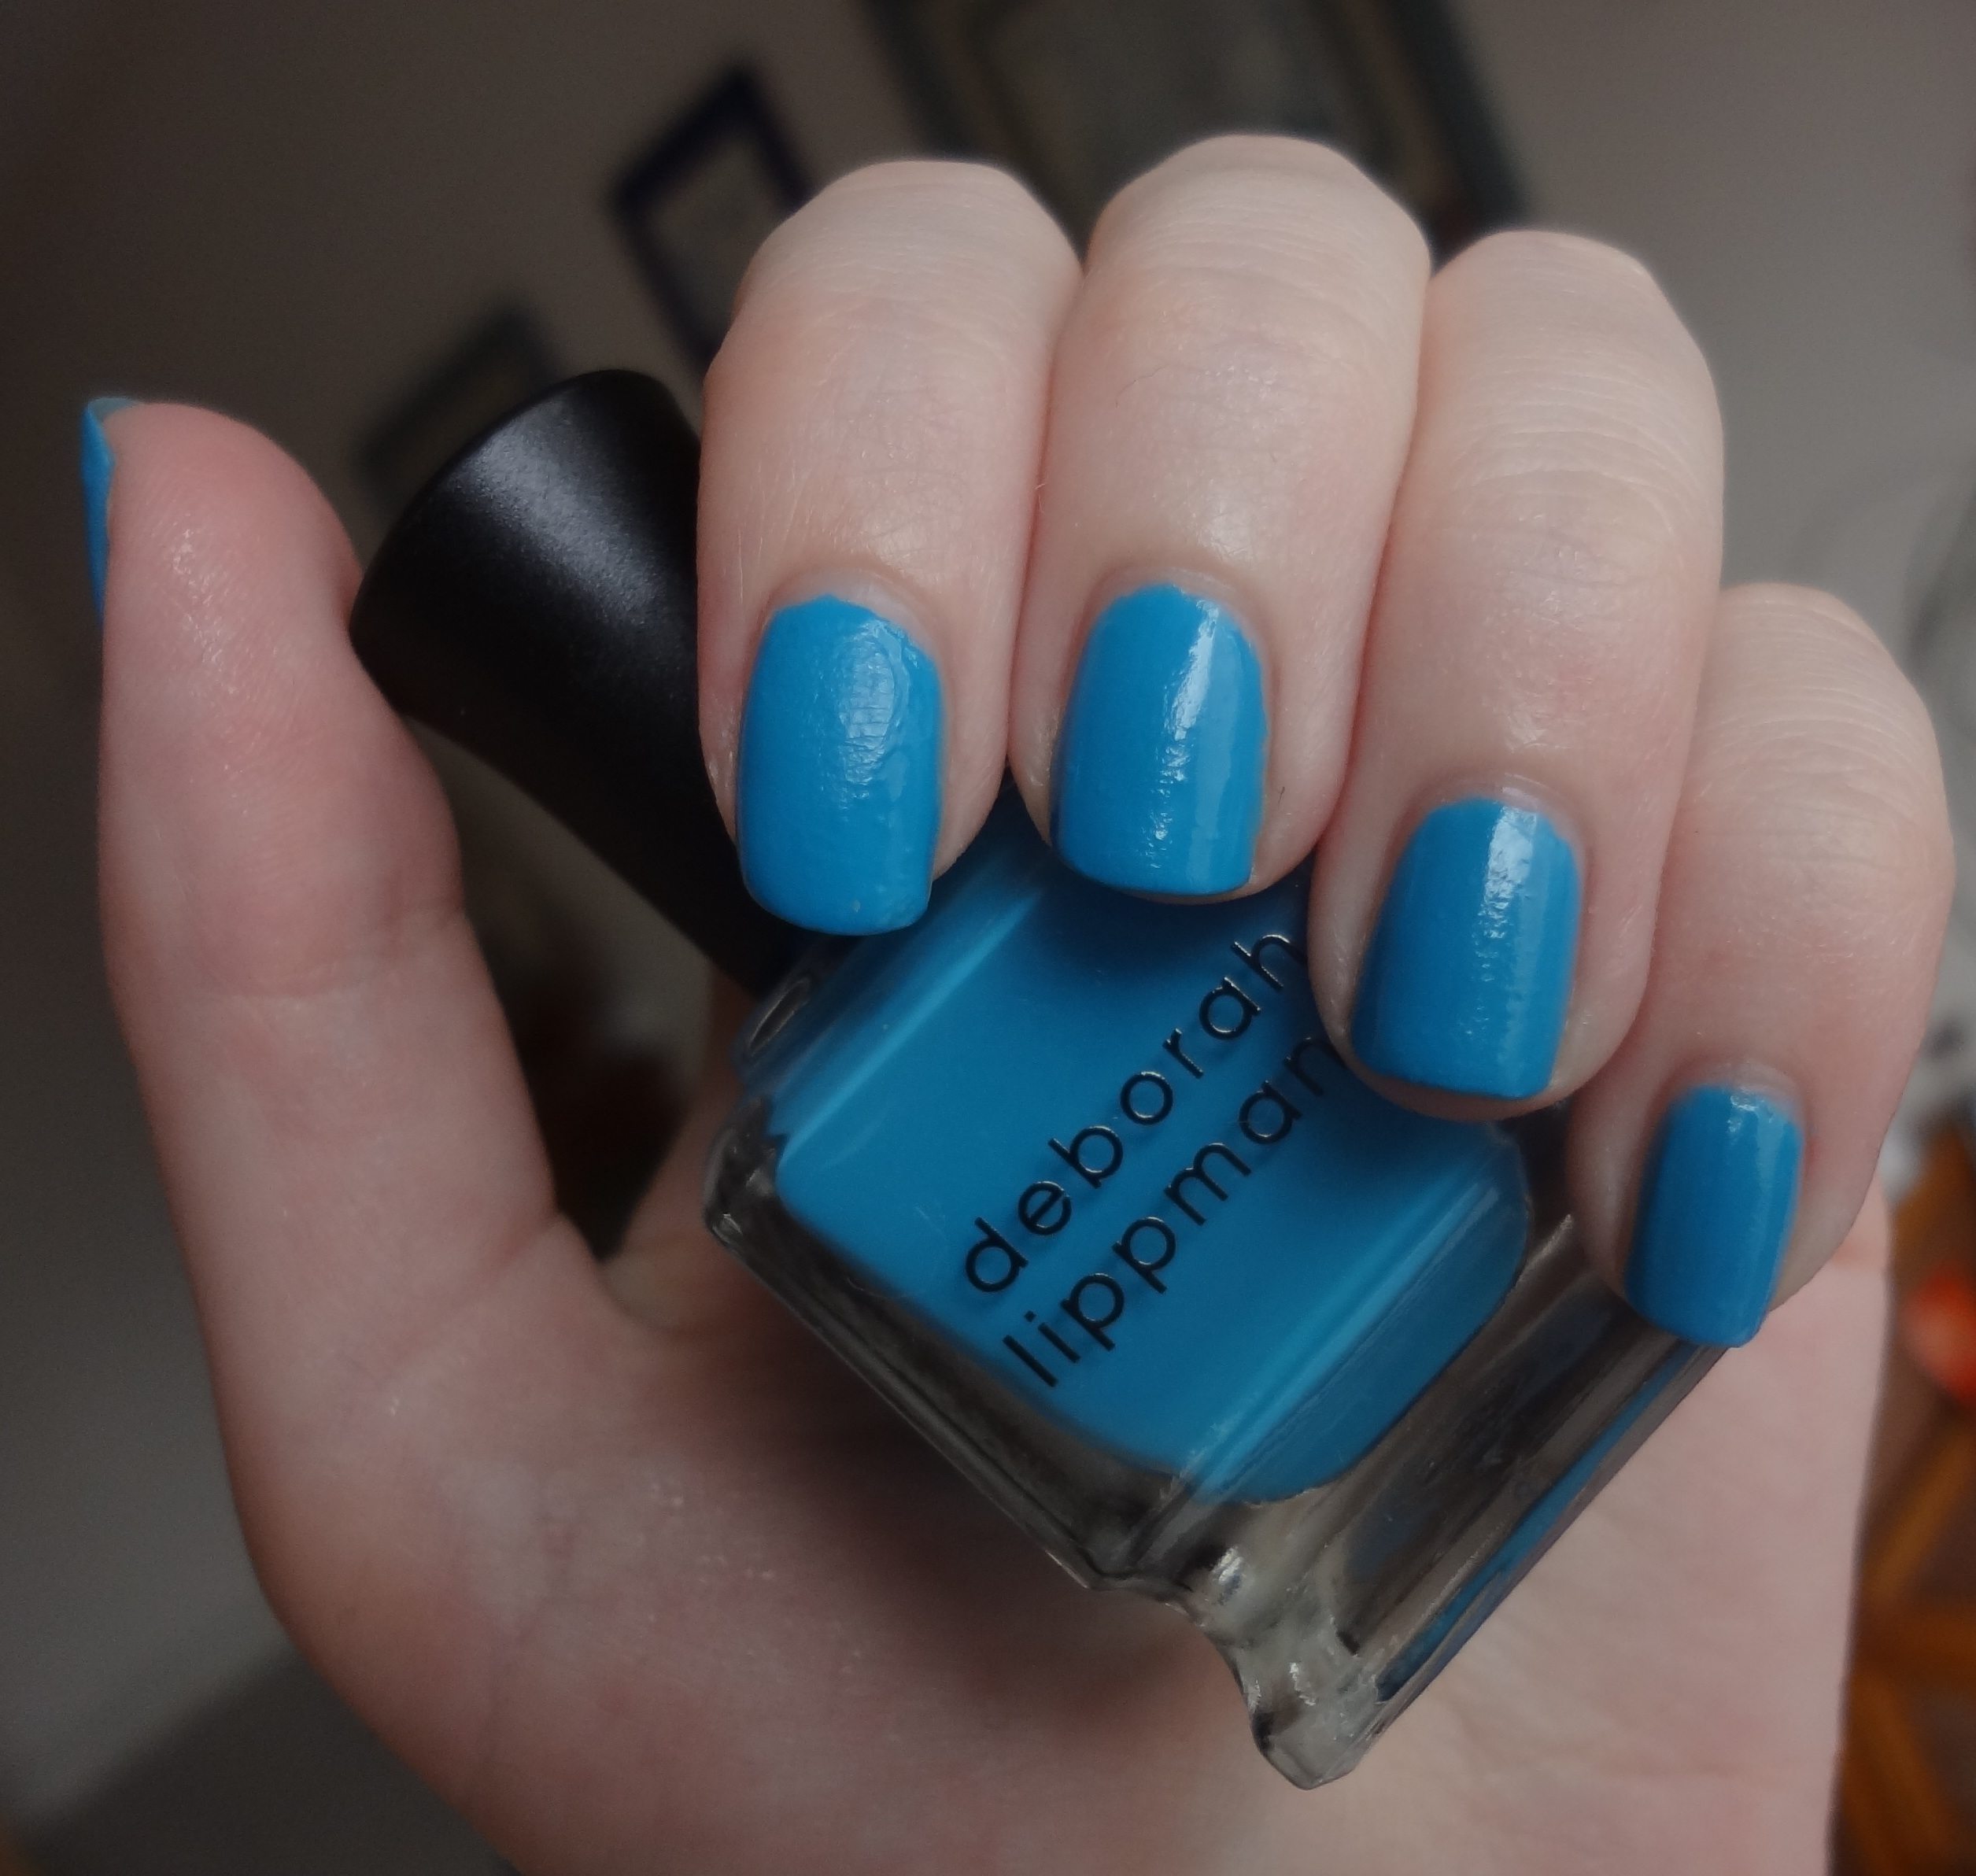 Deborah Lippmann On The Beach & NARS Koliary nail polish review – a ...